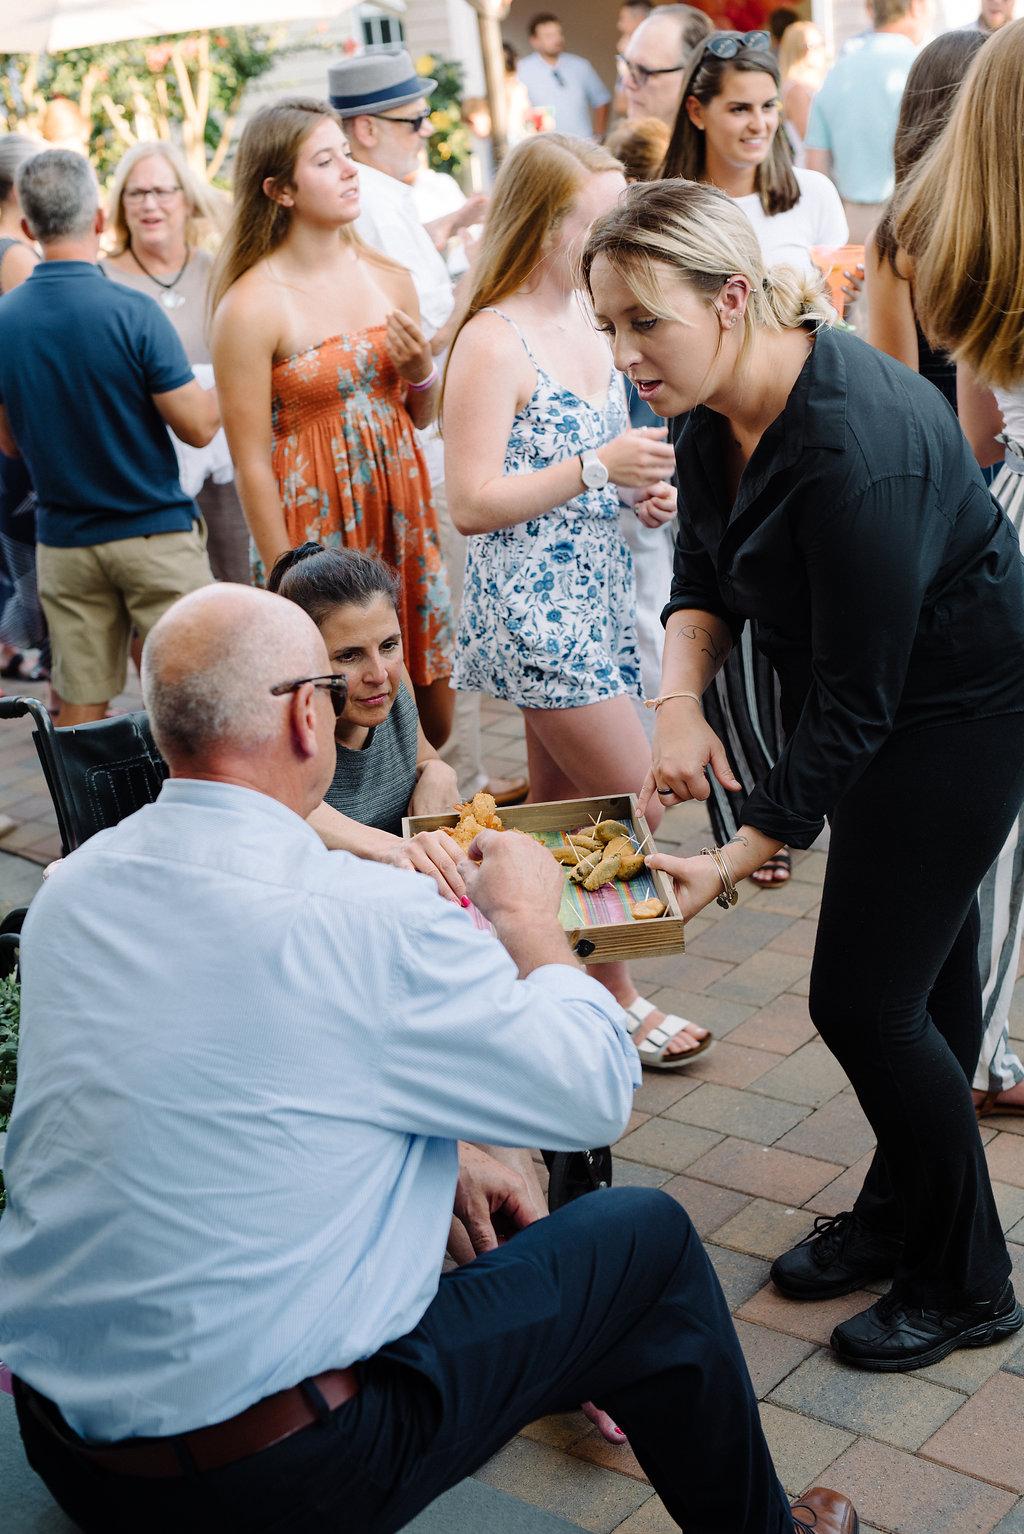 FiestaThemedEngagementParty-Nicole+Mike-SeaGirt-NewJersey-OliviaChristinaPhoto-86.jpg